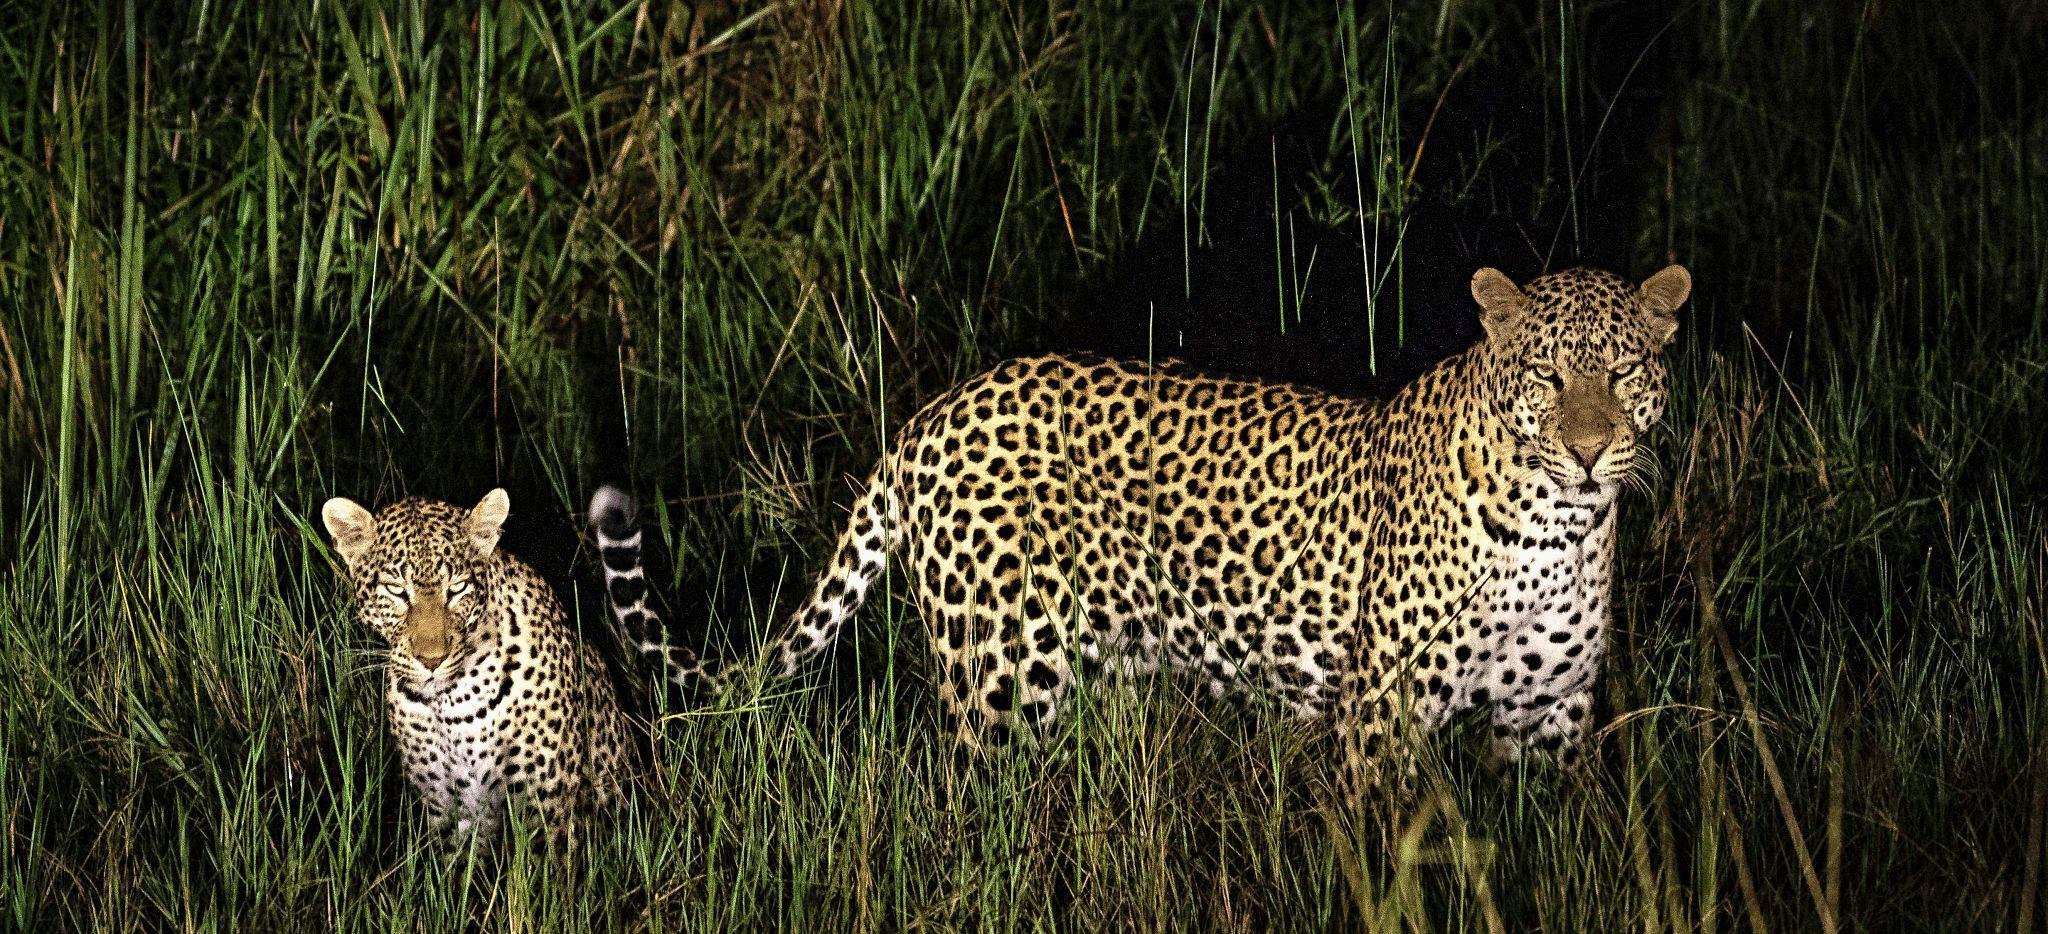 Leopardenmutter mit Jungem, in der Nähe des Magashi Camp